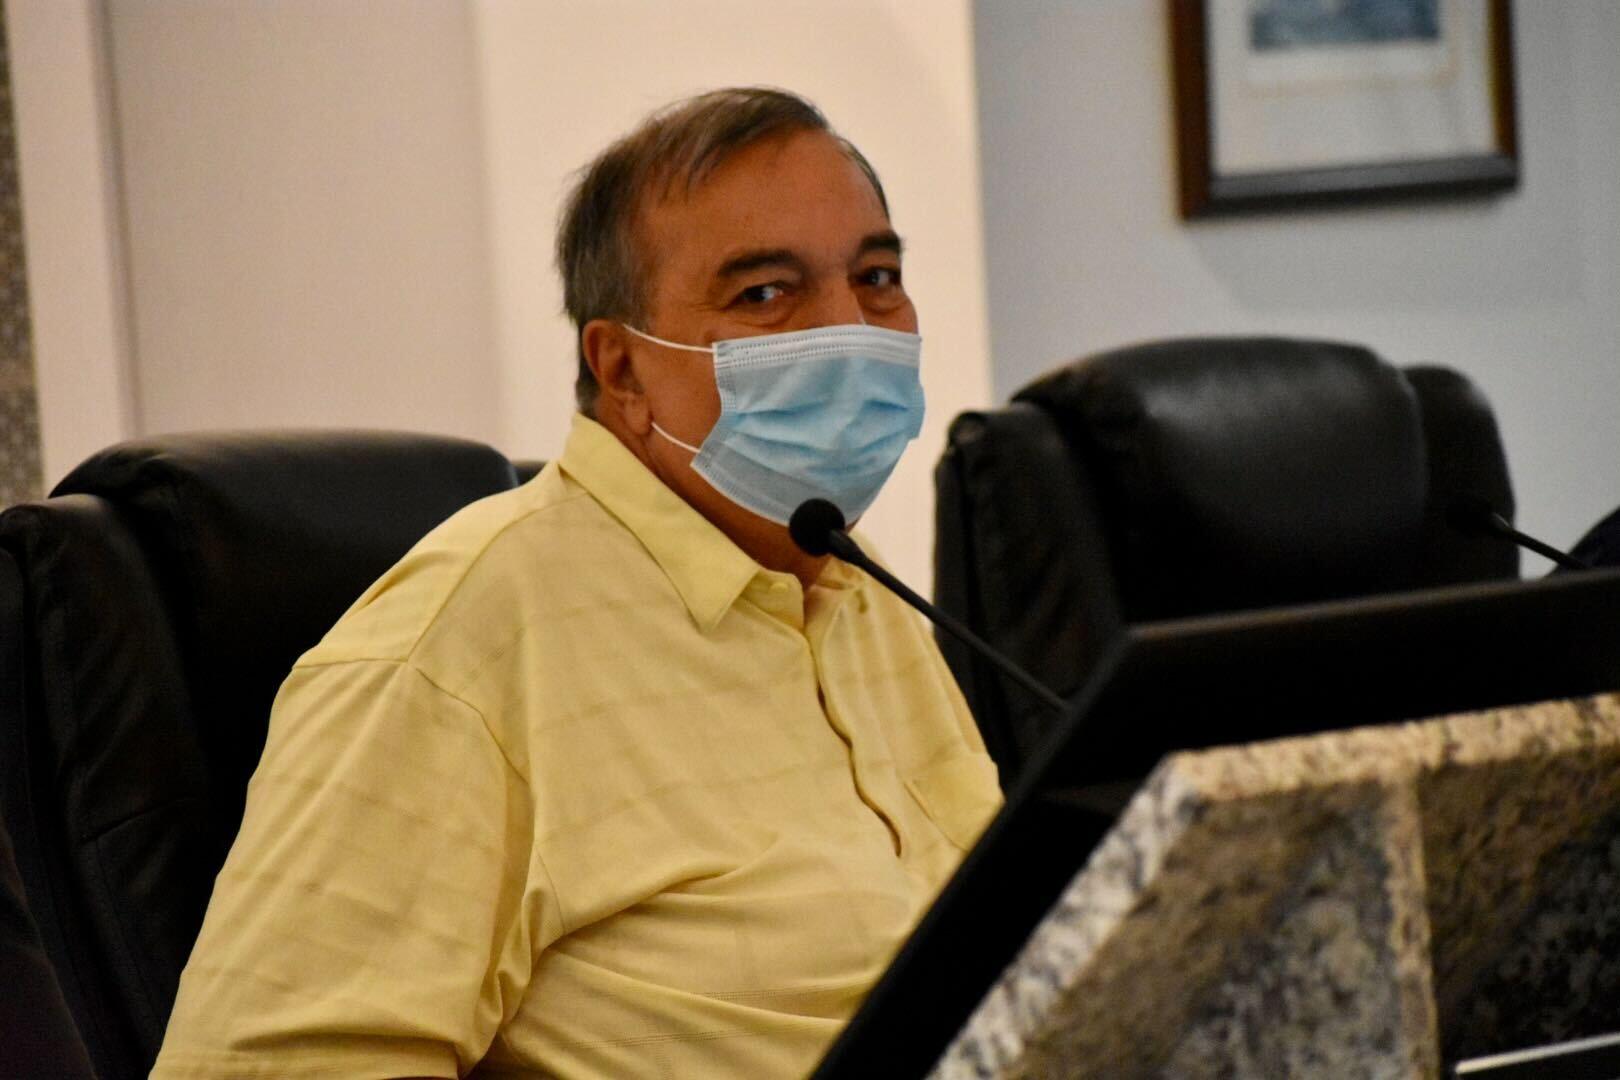 Crestwood Mayor Lou Presta attends a village board meeting Thursday night.